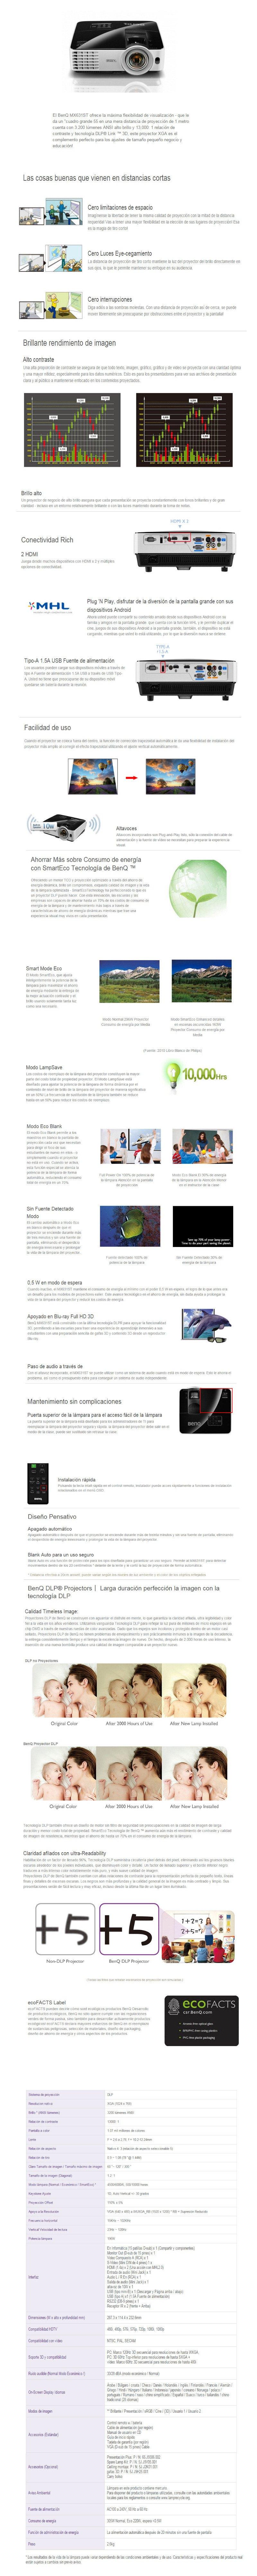 proyector benq mx631st